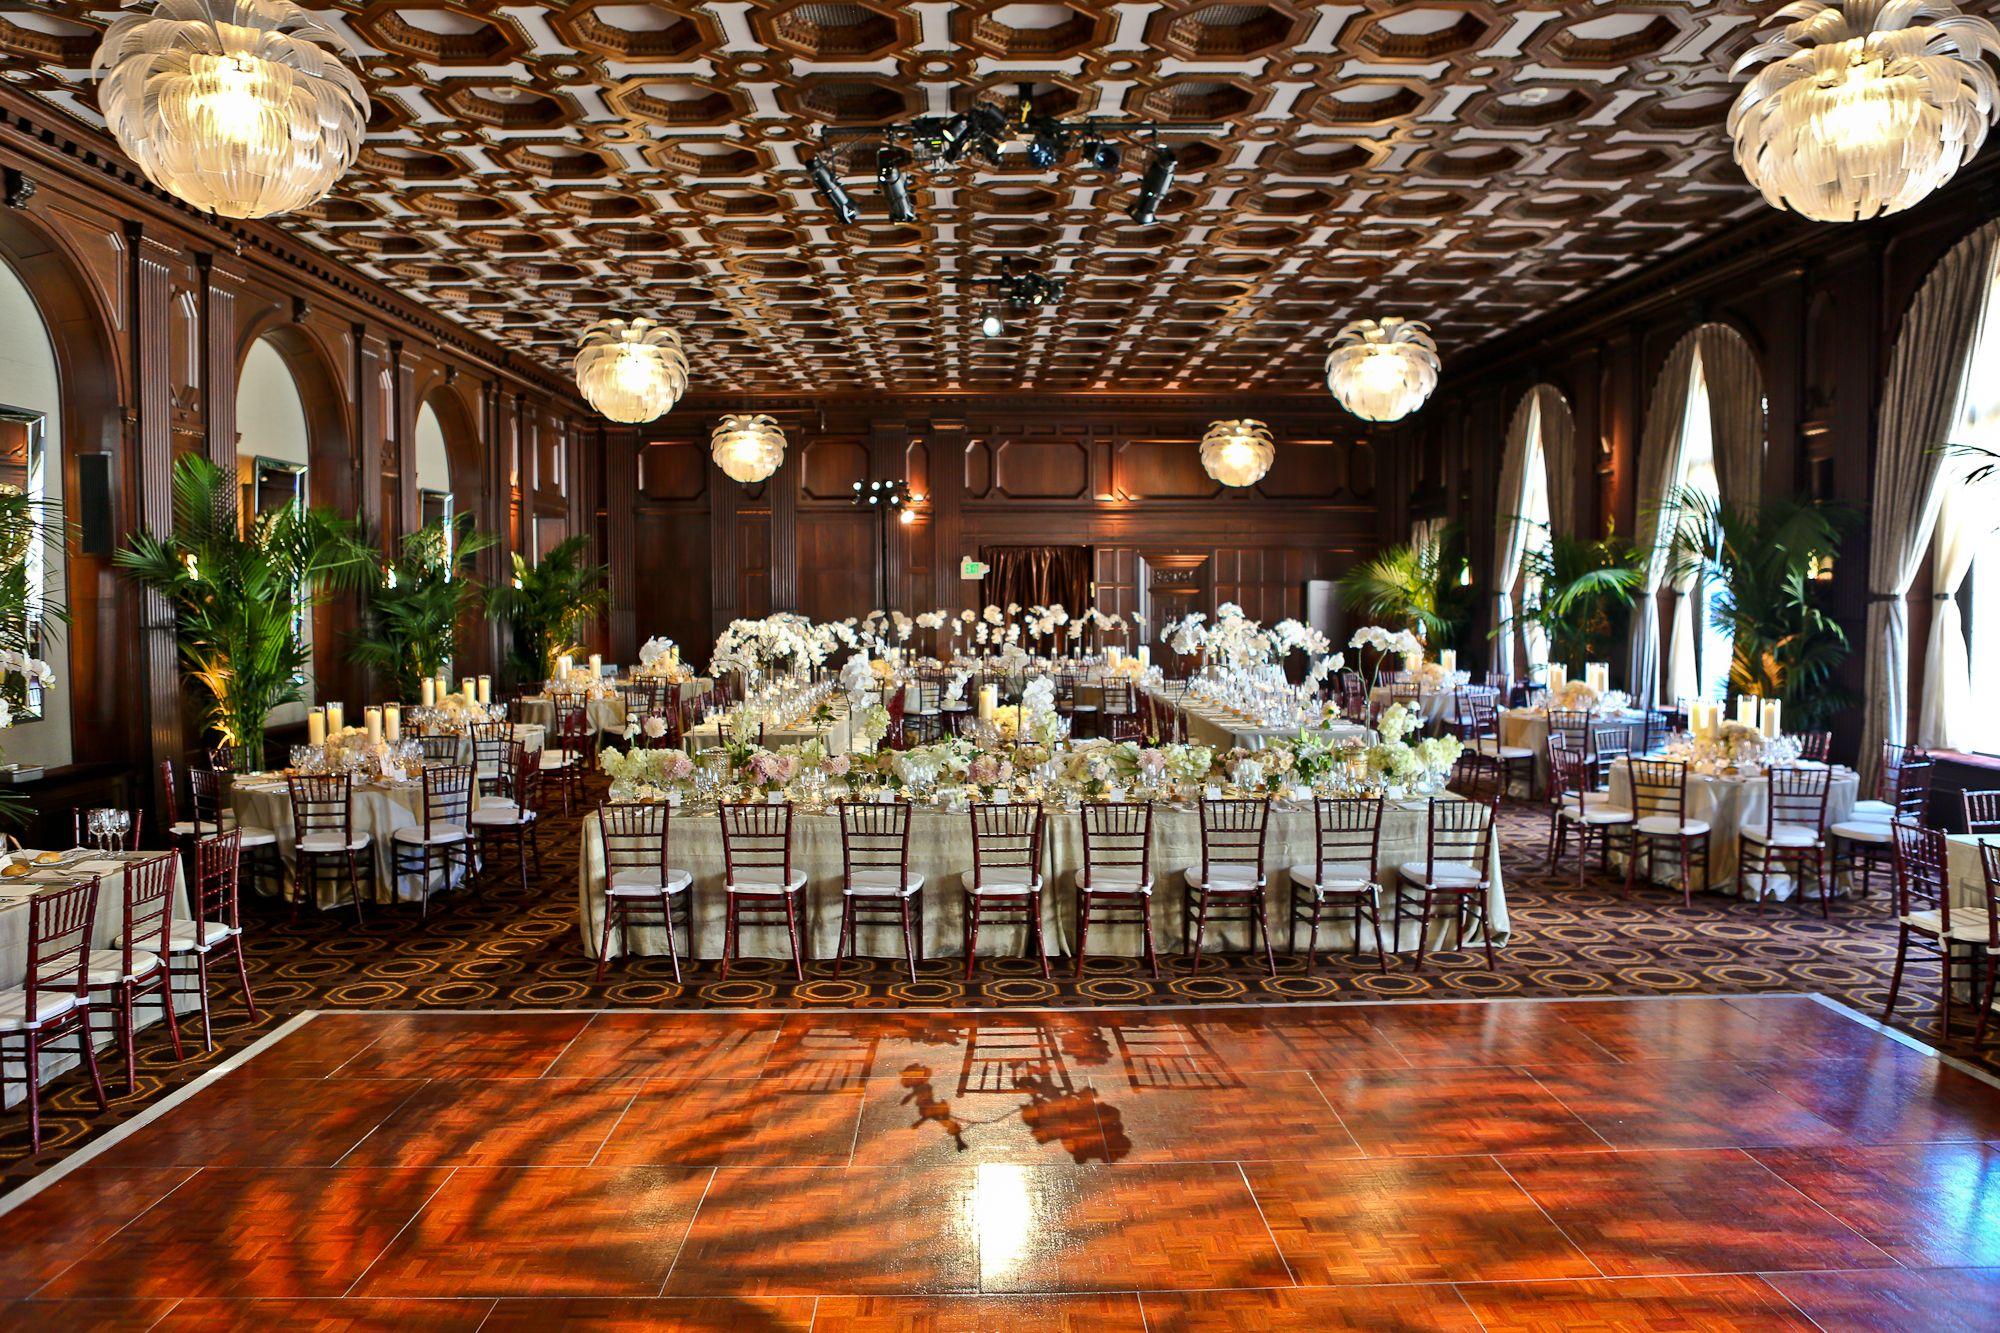 Hindu wedding decoration ideas  Kerri u Jasonus ceremony lighting and décor design began with a